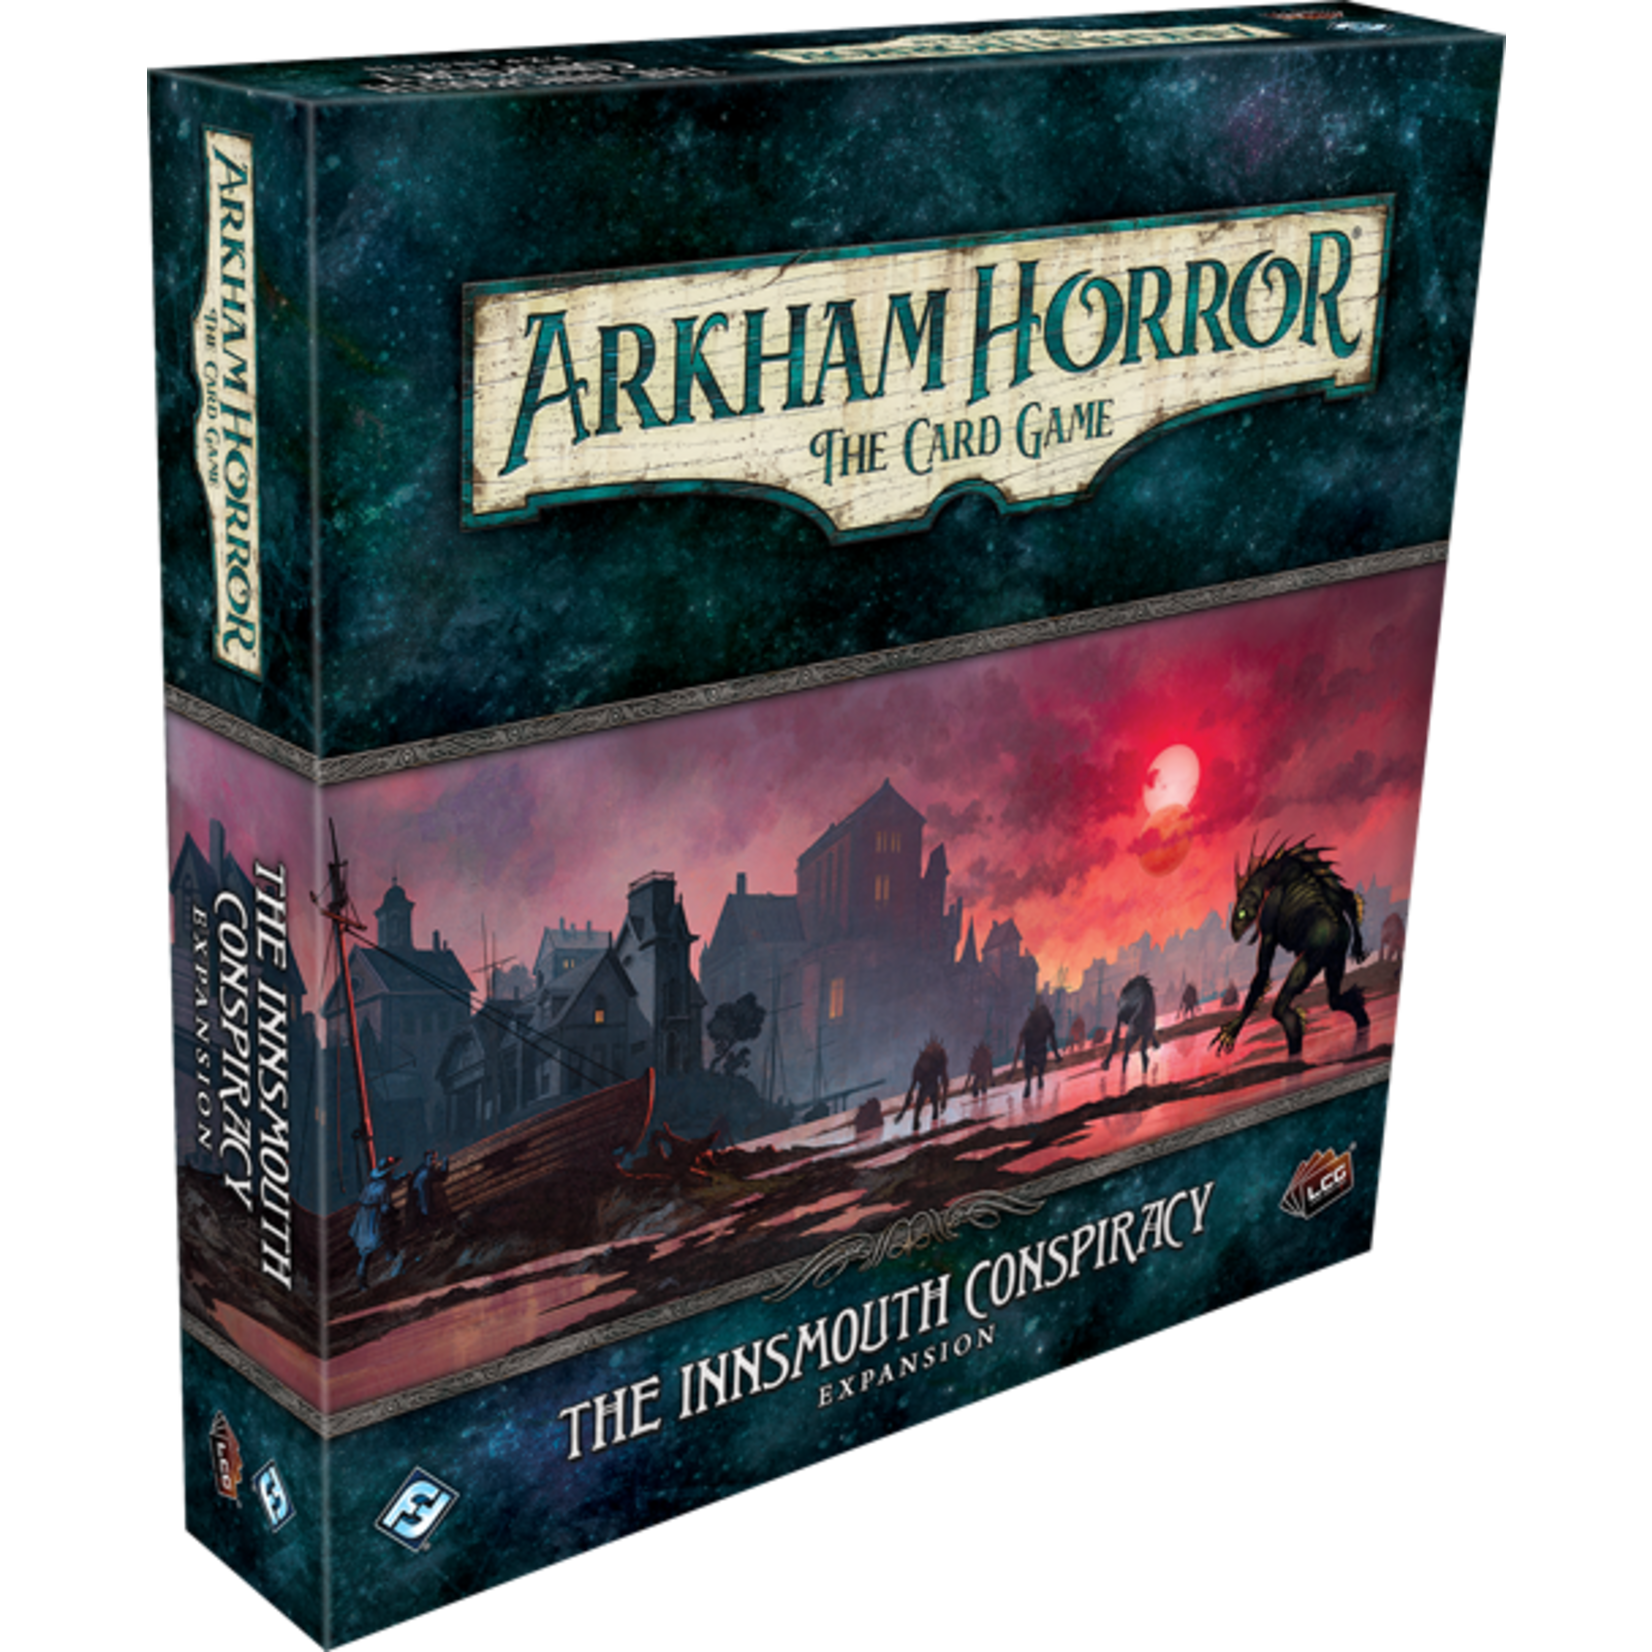 Fantasy Flight Games Arkham Horror LCG: The Innsmouth Conspiracy Expansion